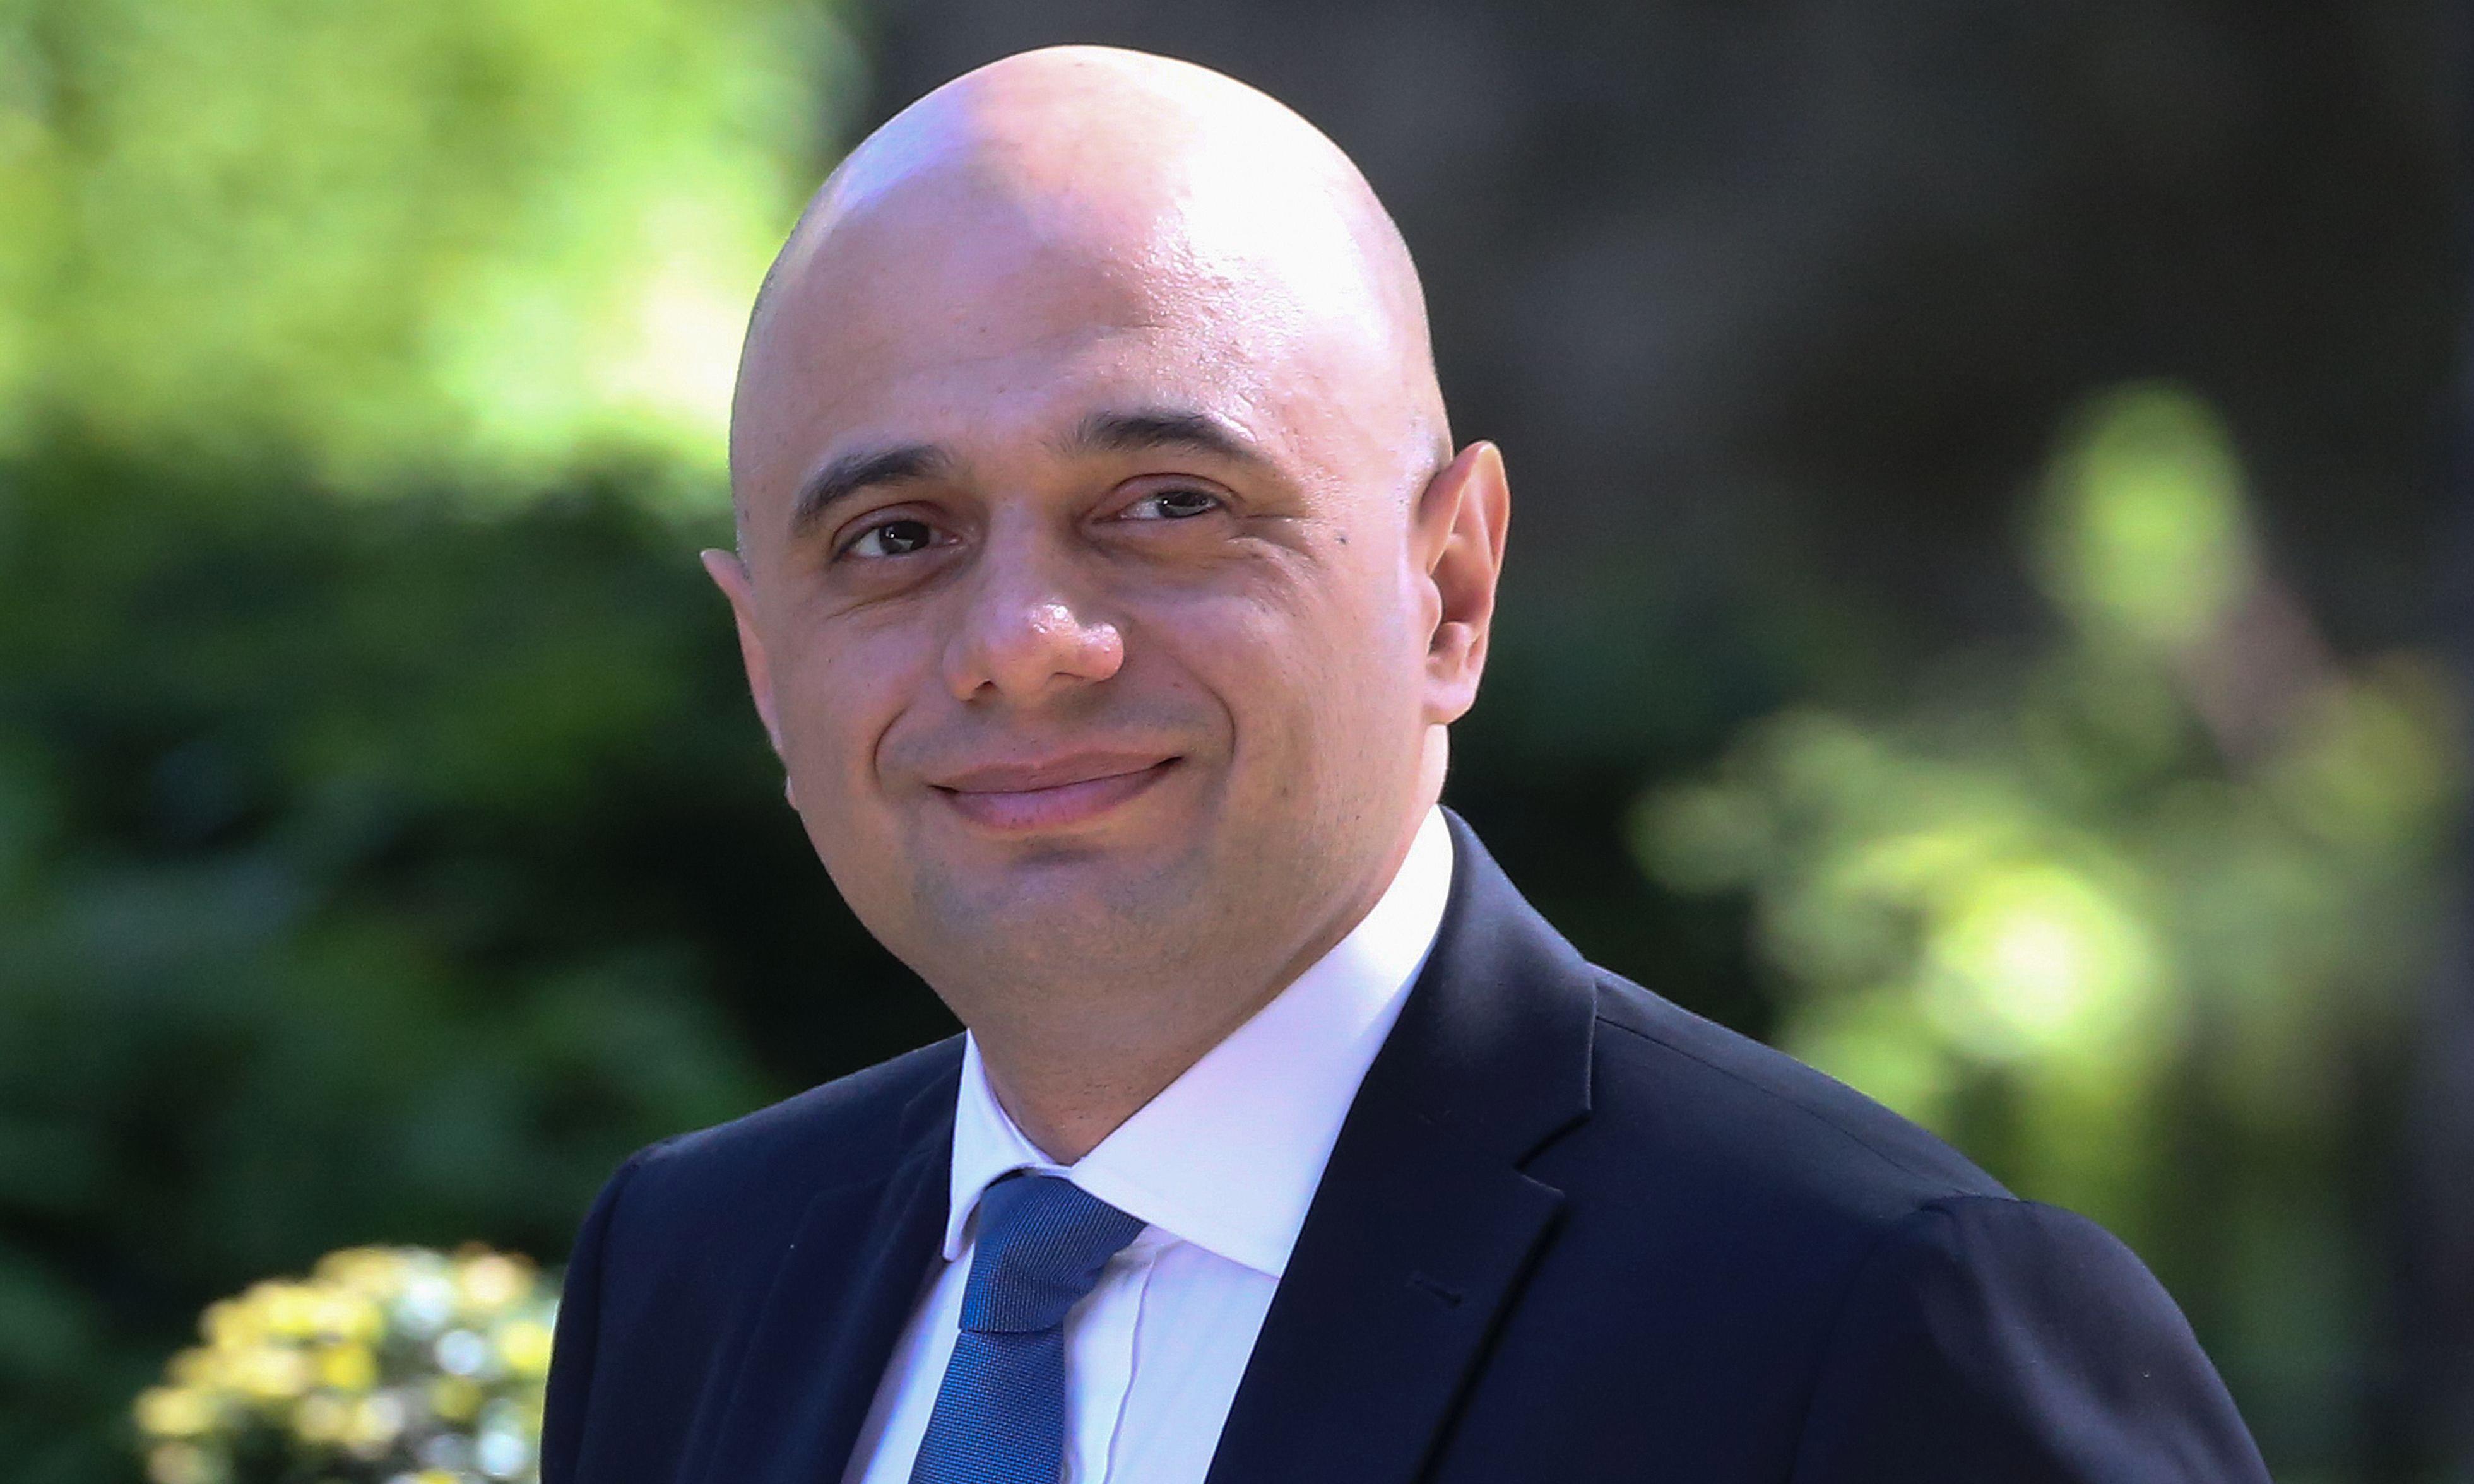 Sajid Javid wants high court hearing into MI5 failures to be secret